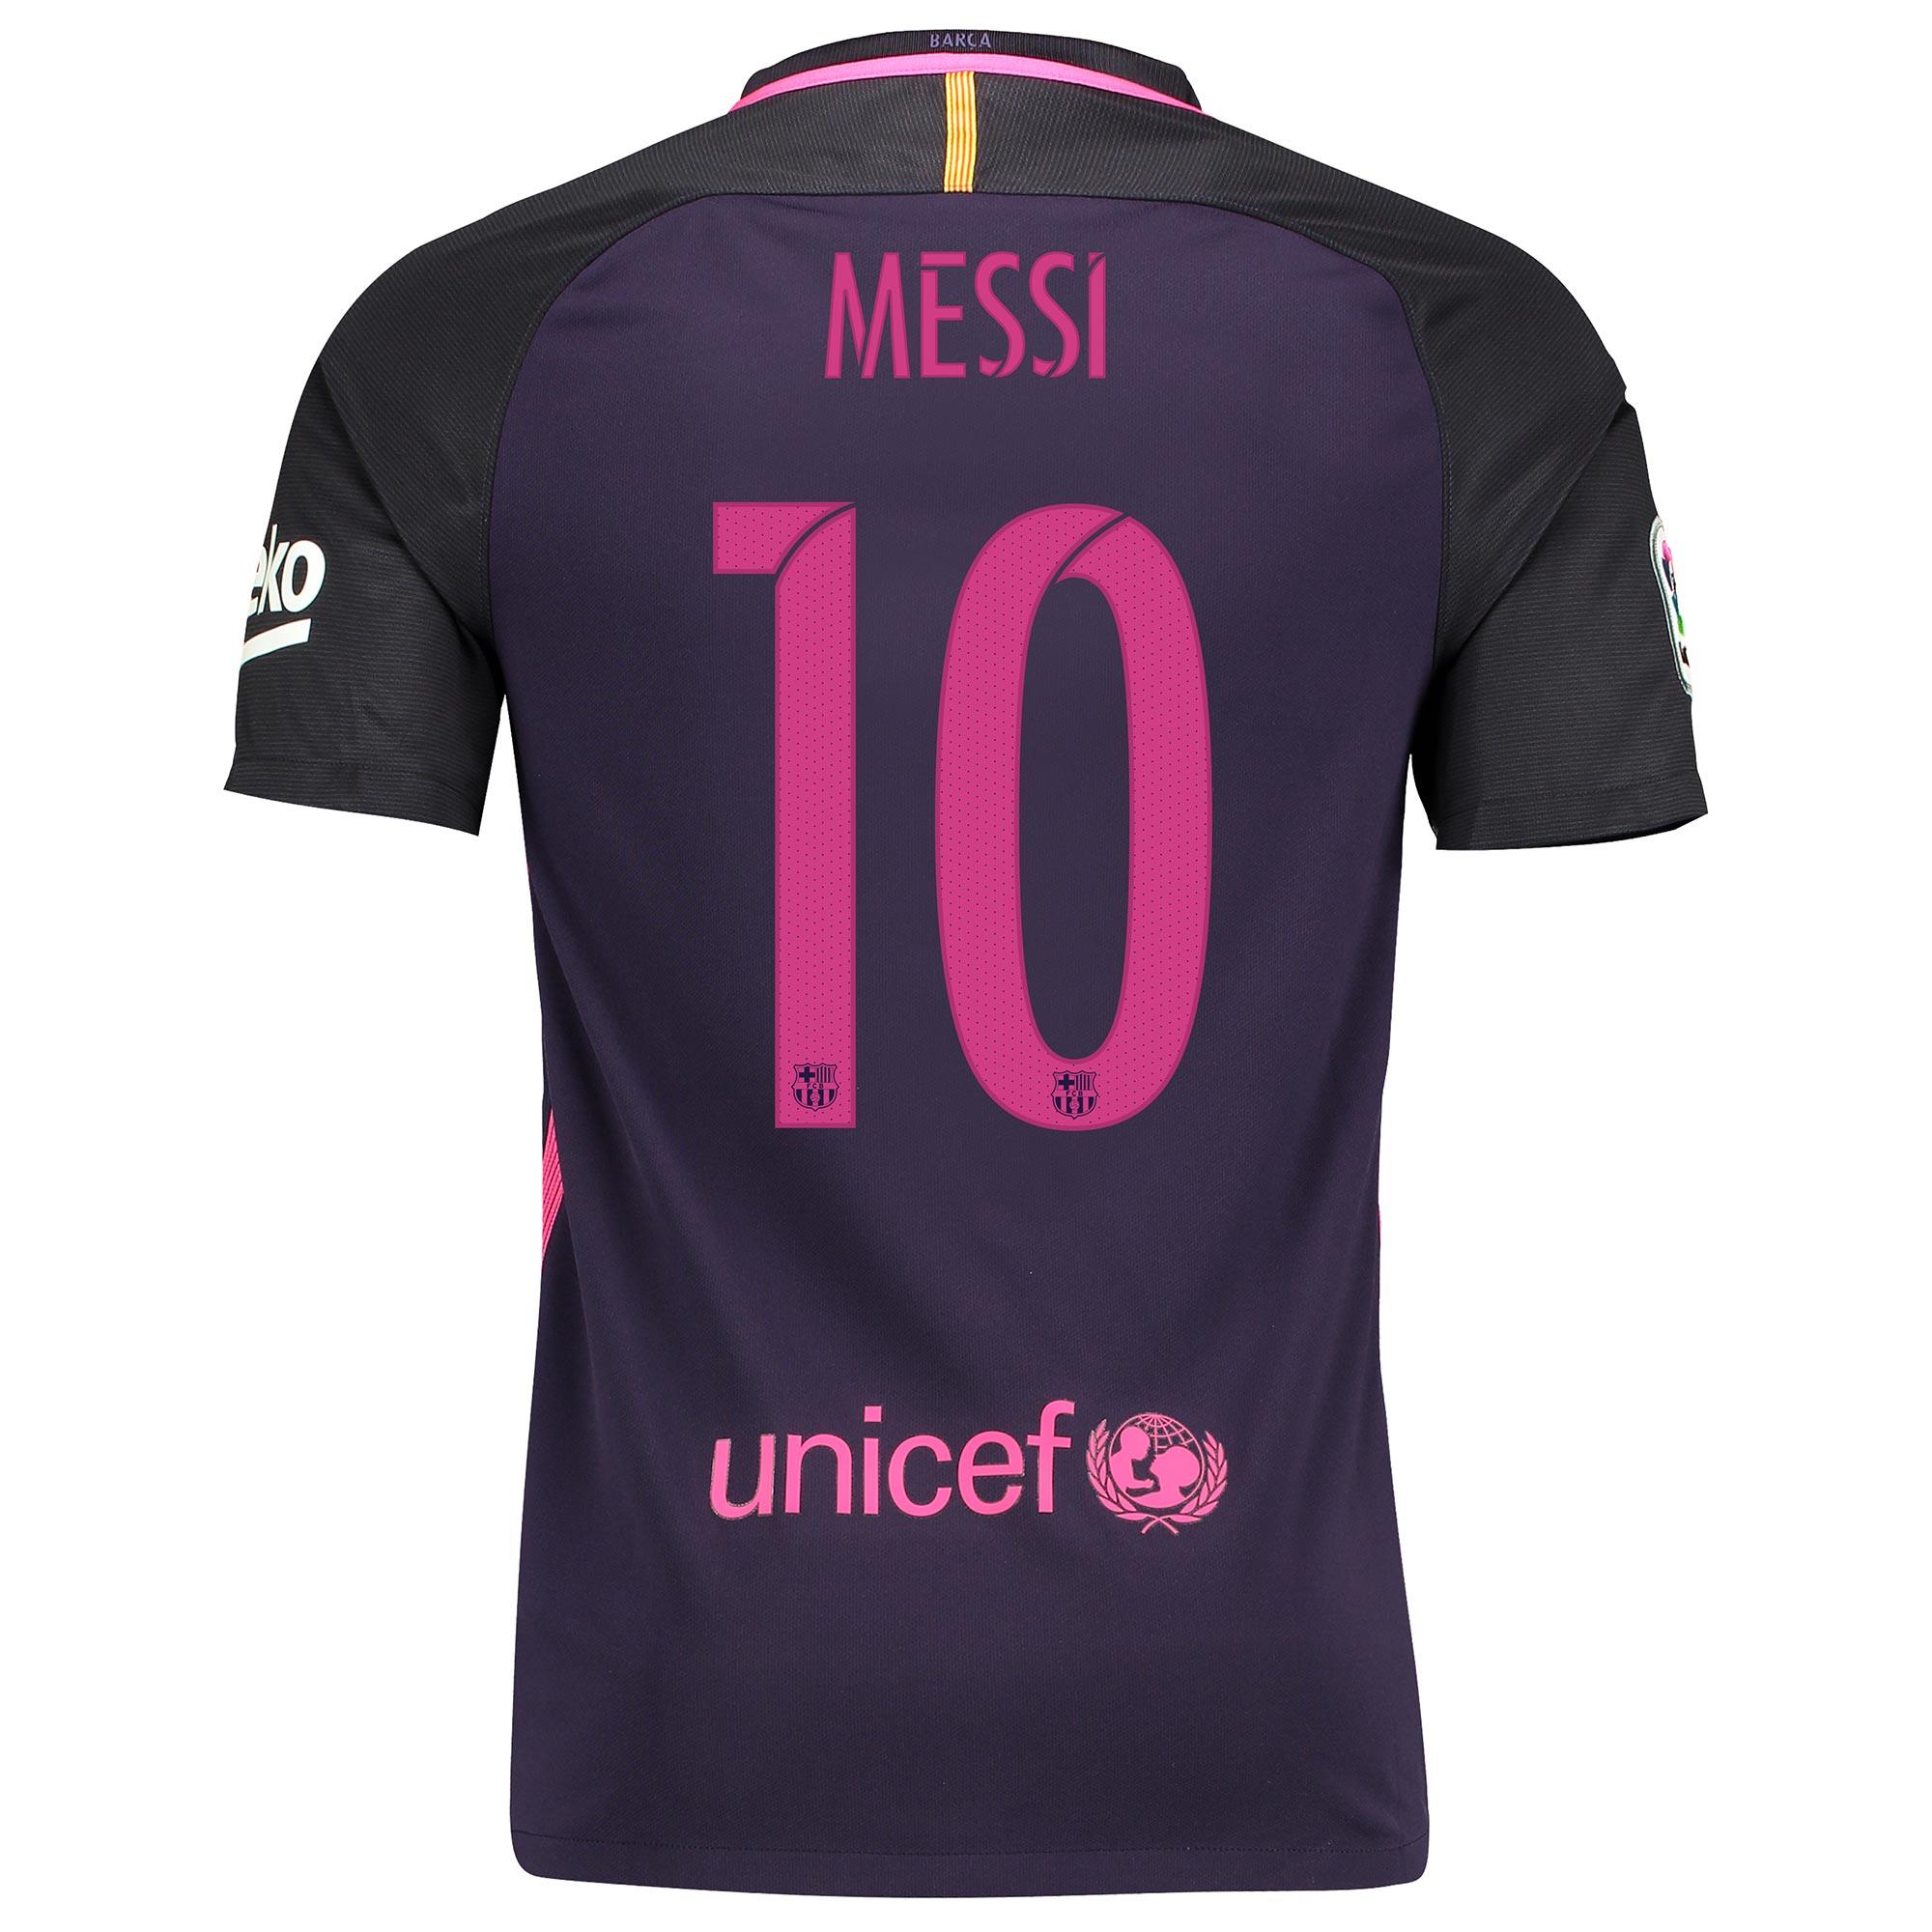 Barcelona Away Shirt 2016-17 - Sponsored with Messi 10 printing, Purple